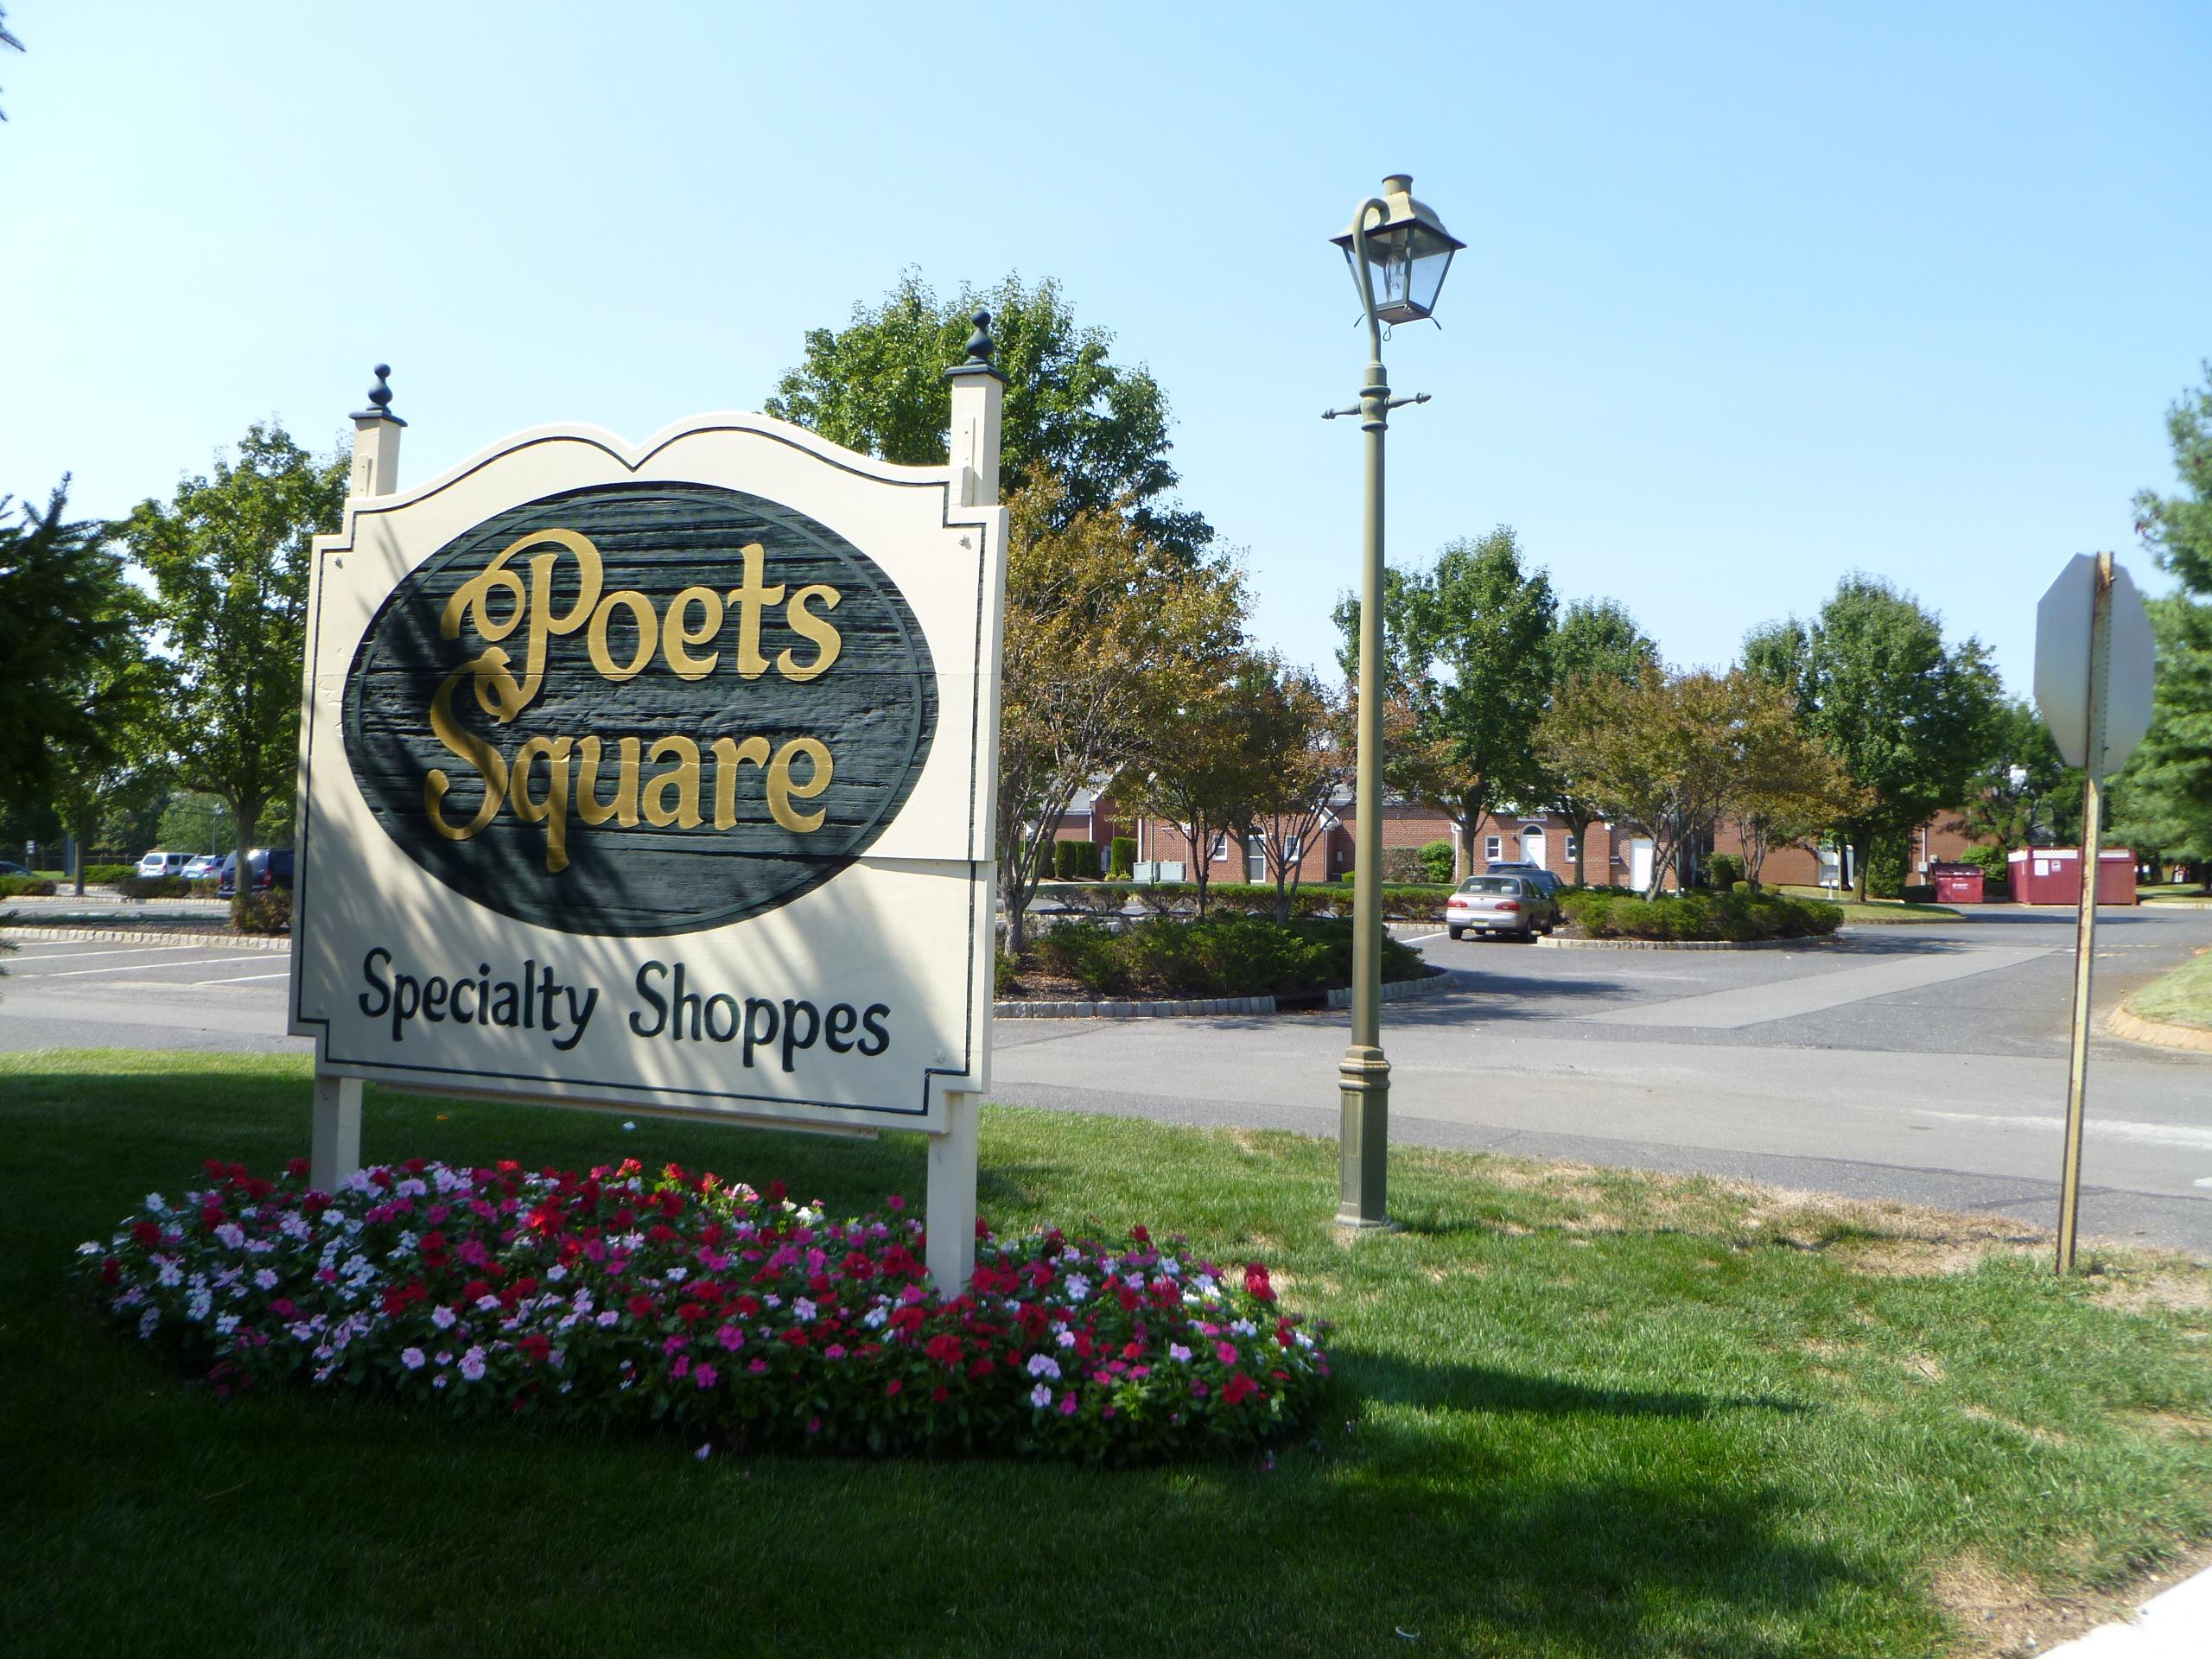 Poets Square